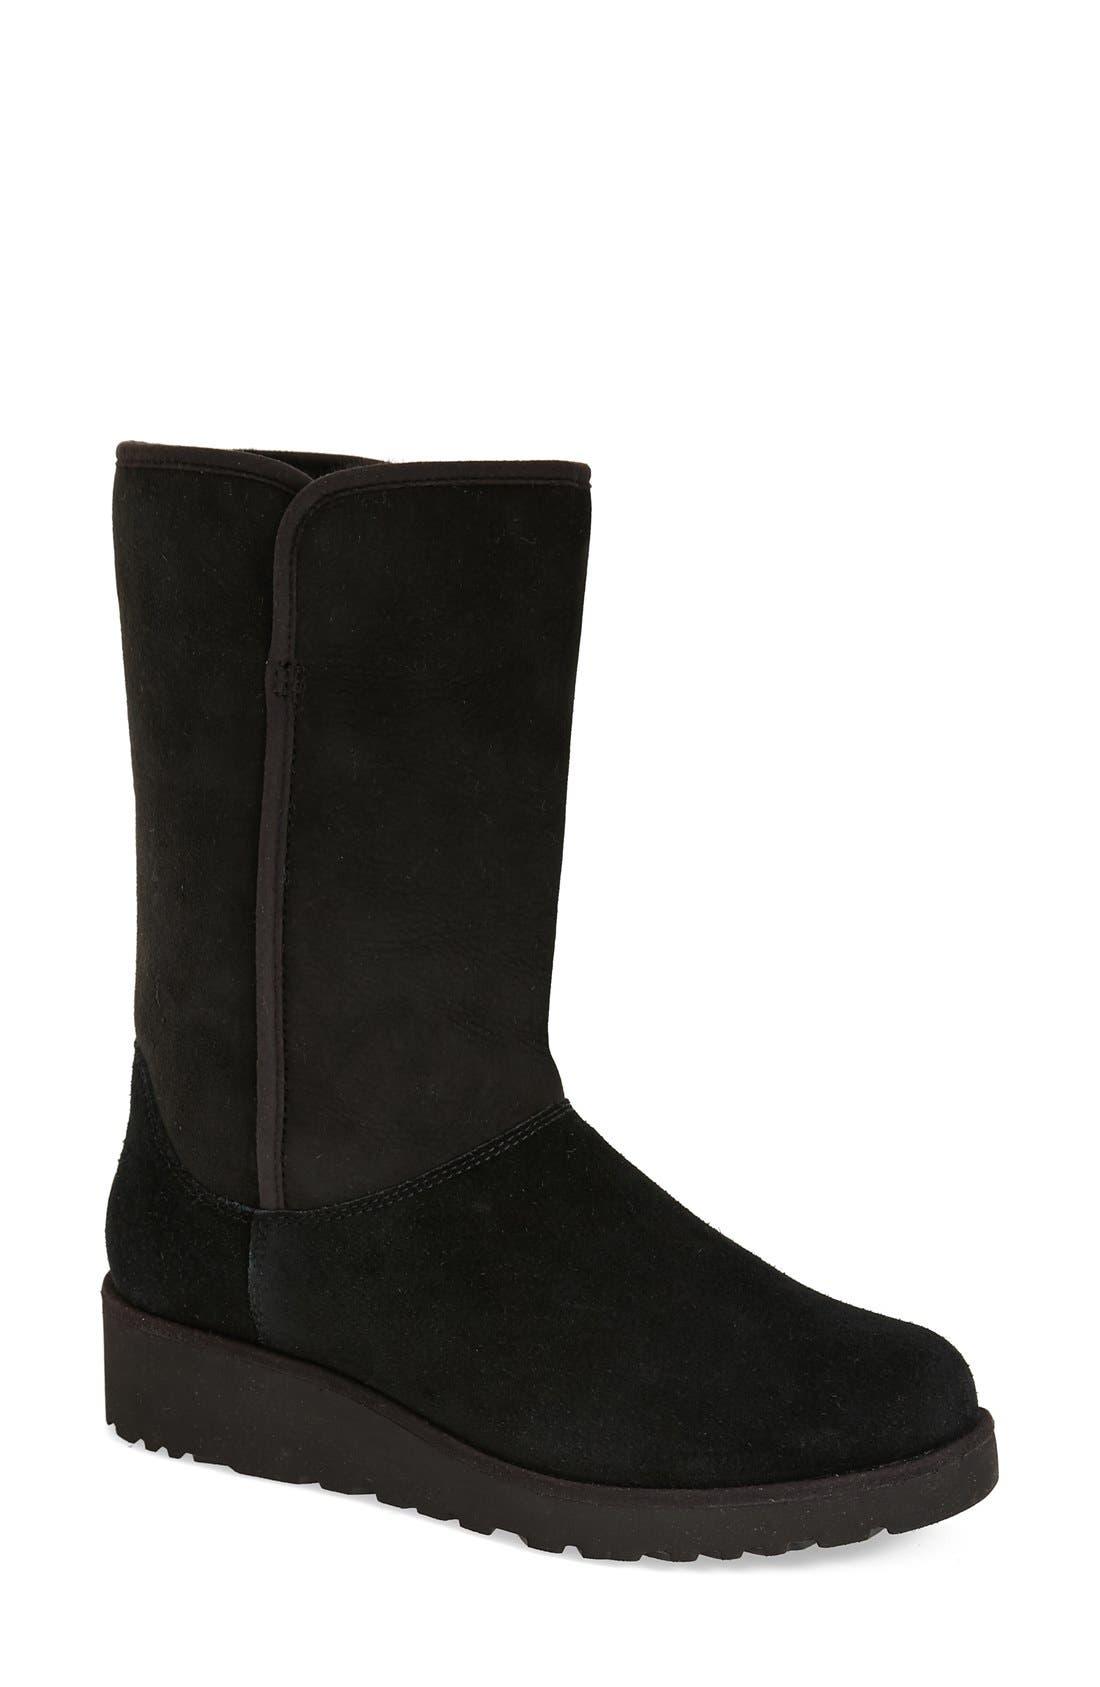 Ugg Amie - Classic Slim(TM) Water Resistant Short Boot, Black